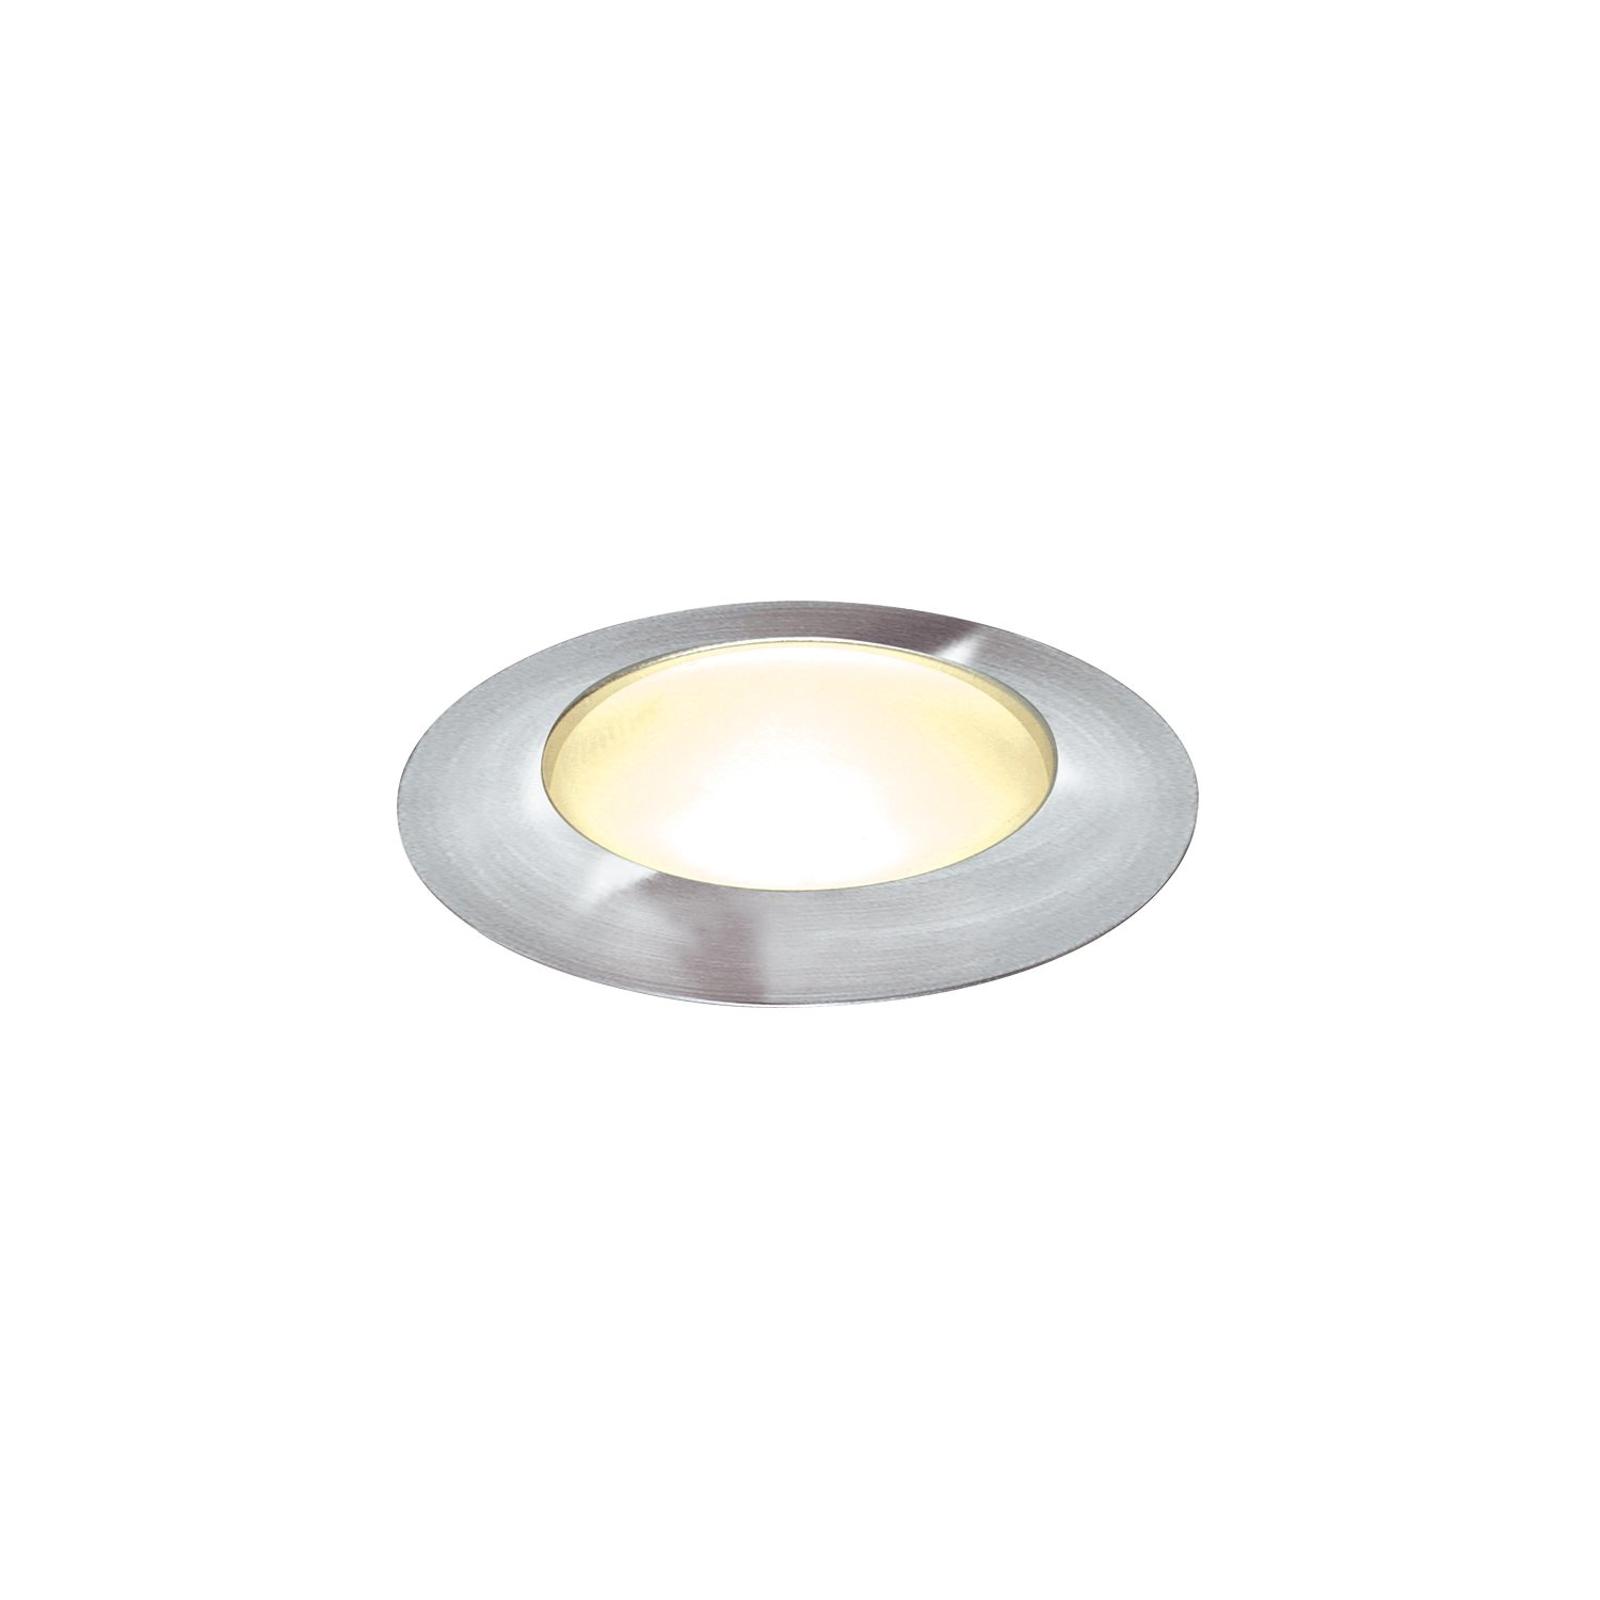 TRAIL LITE ROUND LED-jordspot med varmhvidt lys